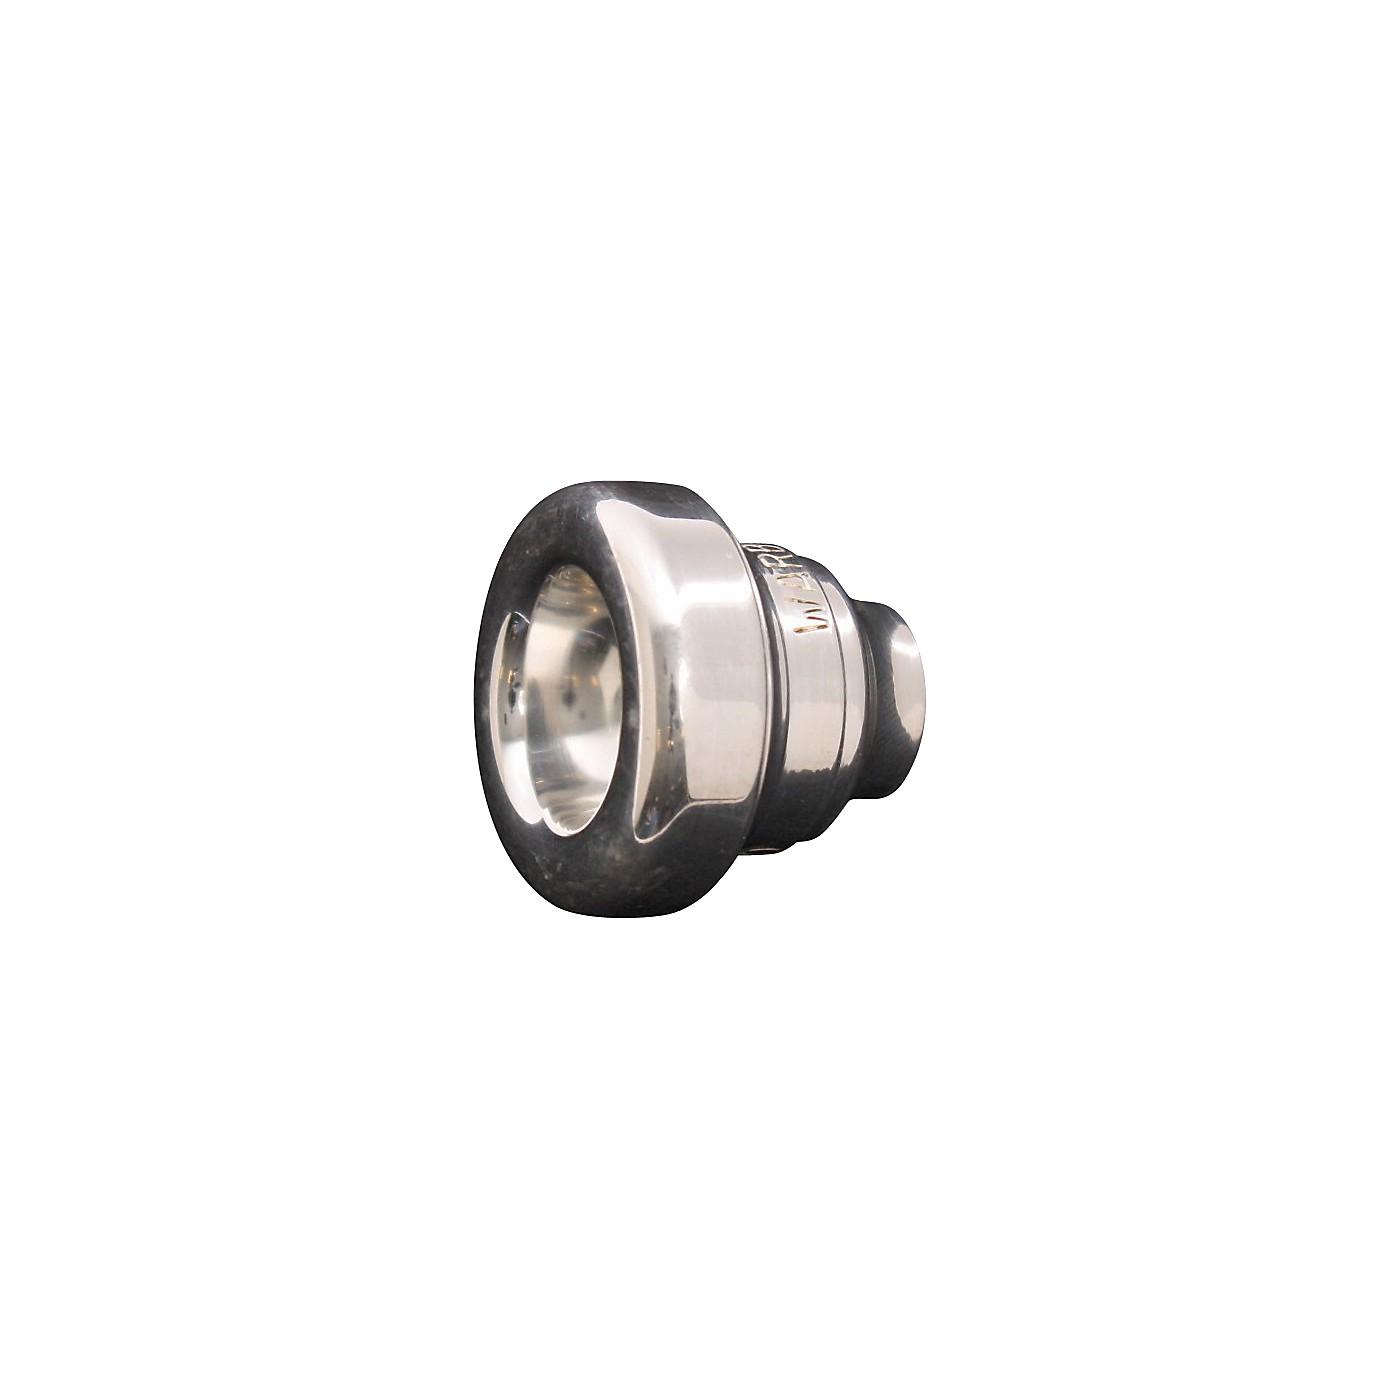 Warburton Two-Piece Tenor Trombone Mouthpiece System in Silver thumbnail